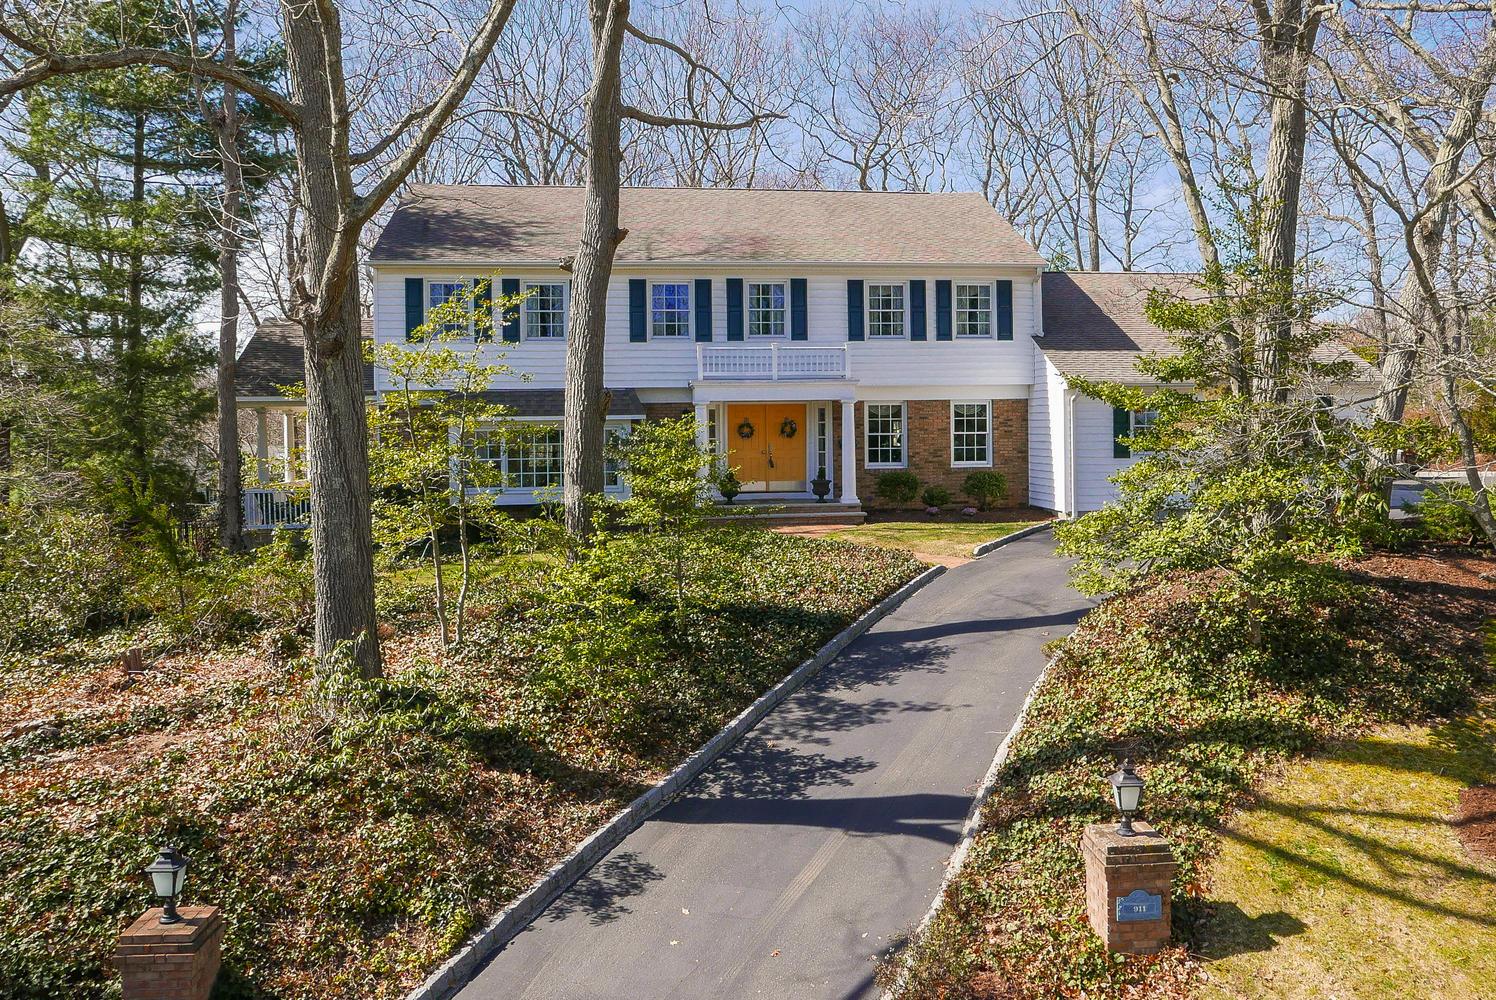 Частный односемейный дом для того Продажа на Beautiful Home in Brielle! 911 Teaberry Lane Brielle, Нью-Джерси, 08730 Соединенные Штаты